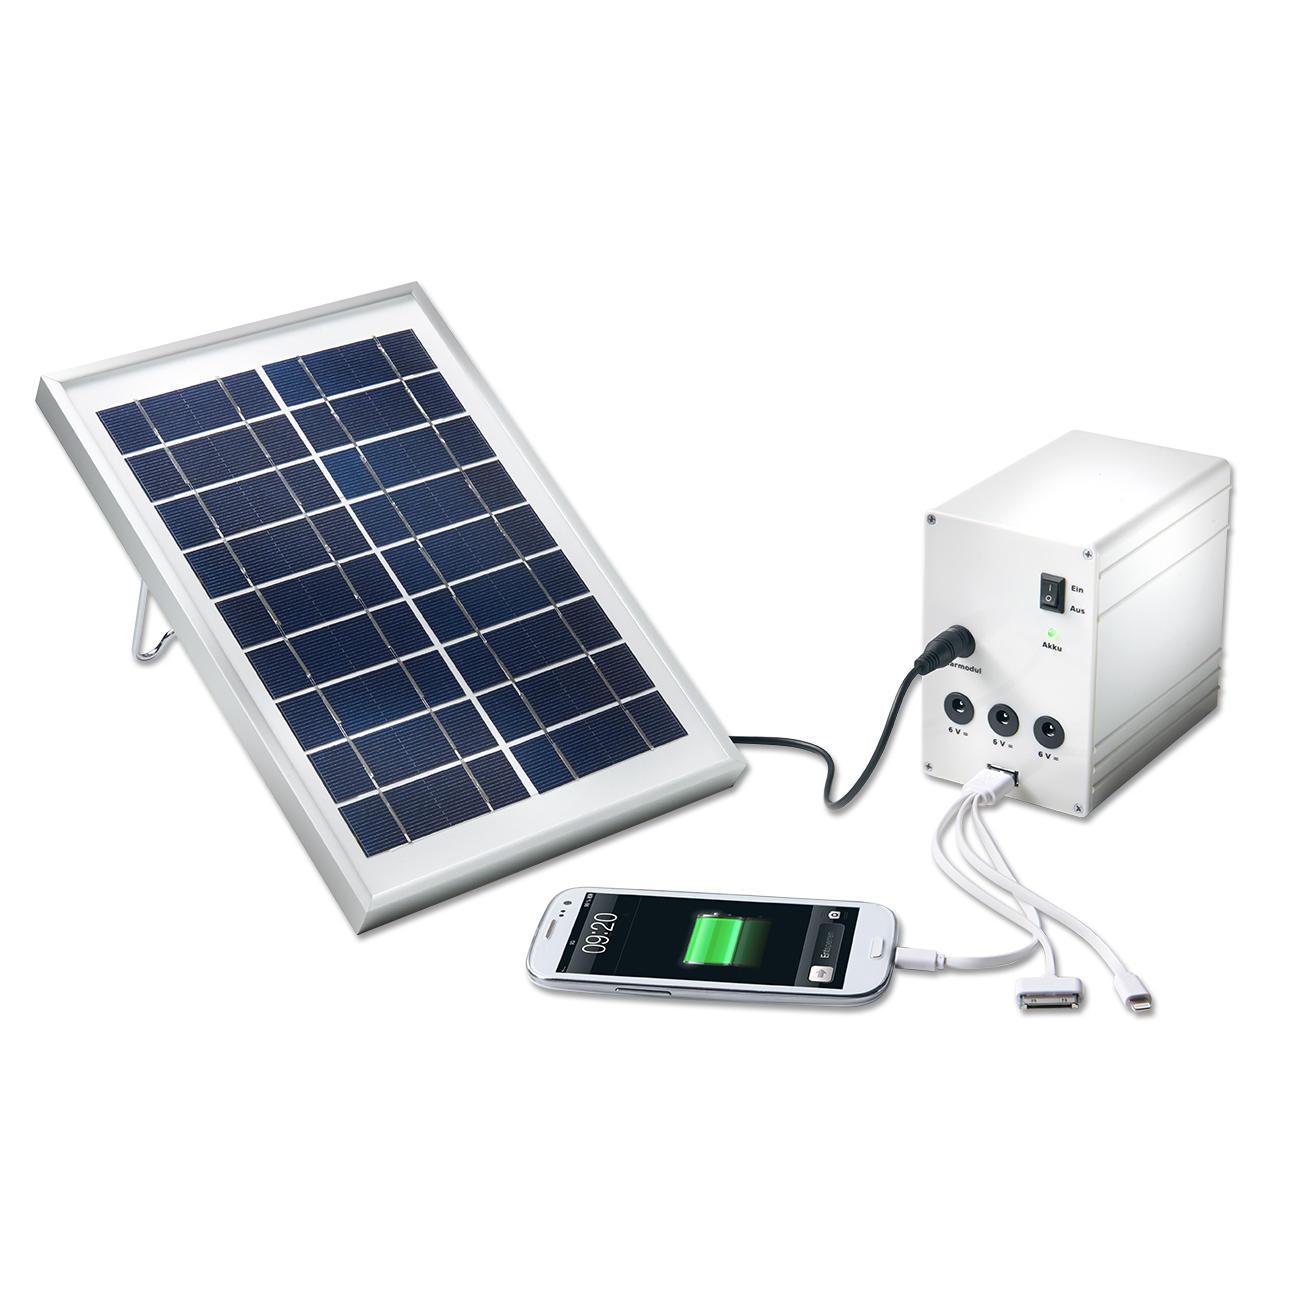 Esotec solar licht und ladesystem multi power solar for Solar licht